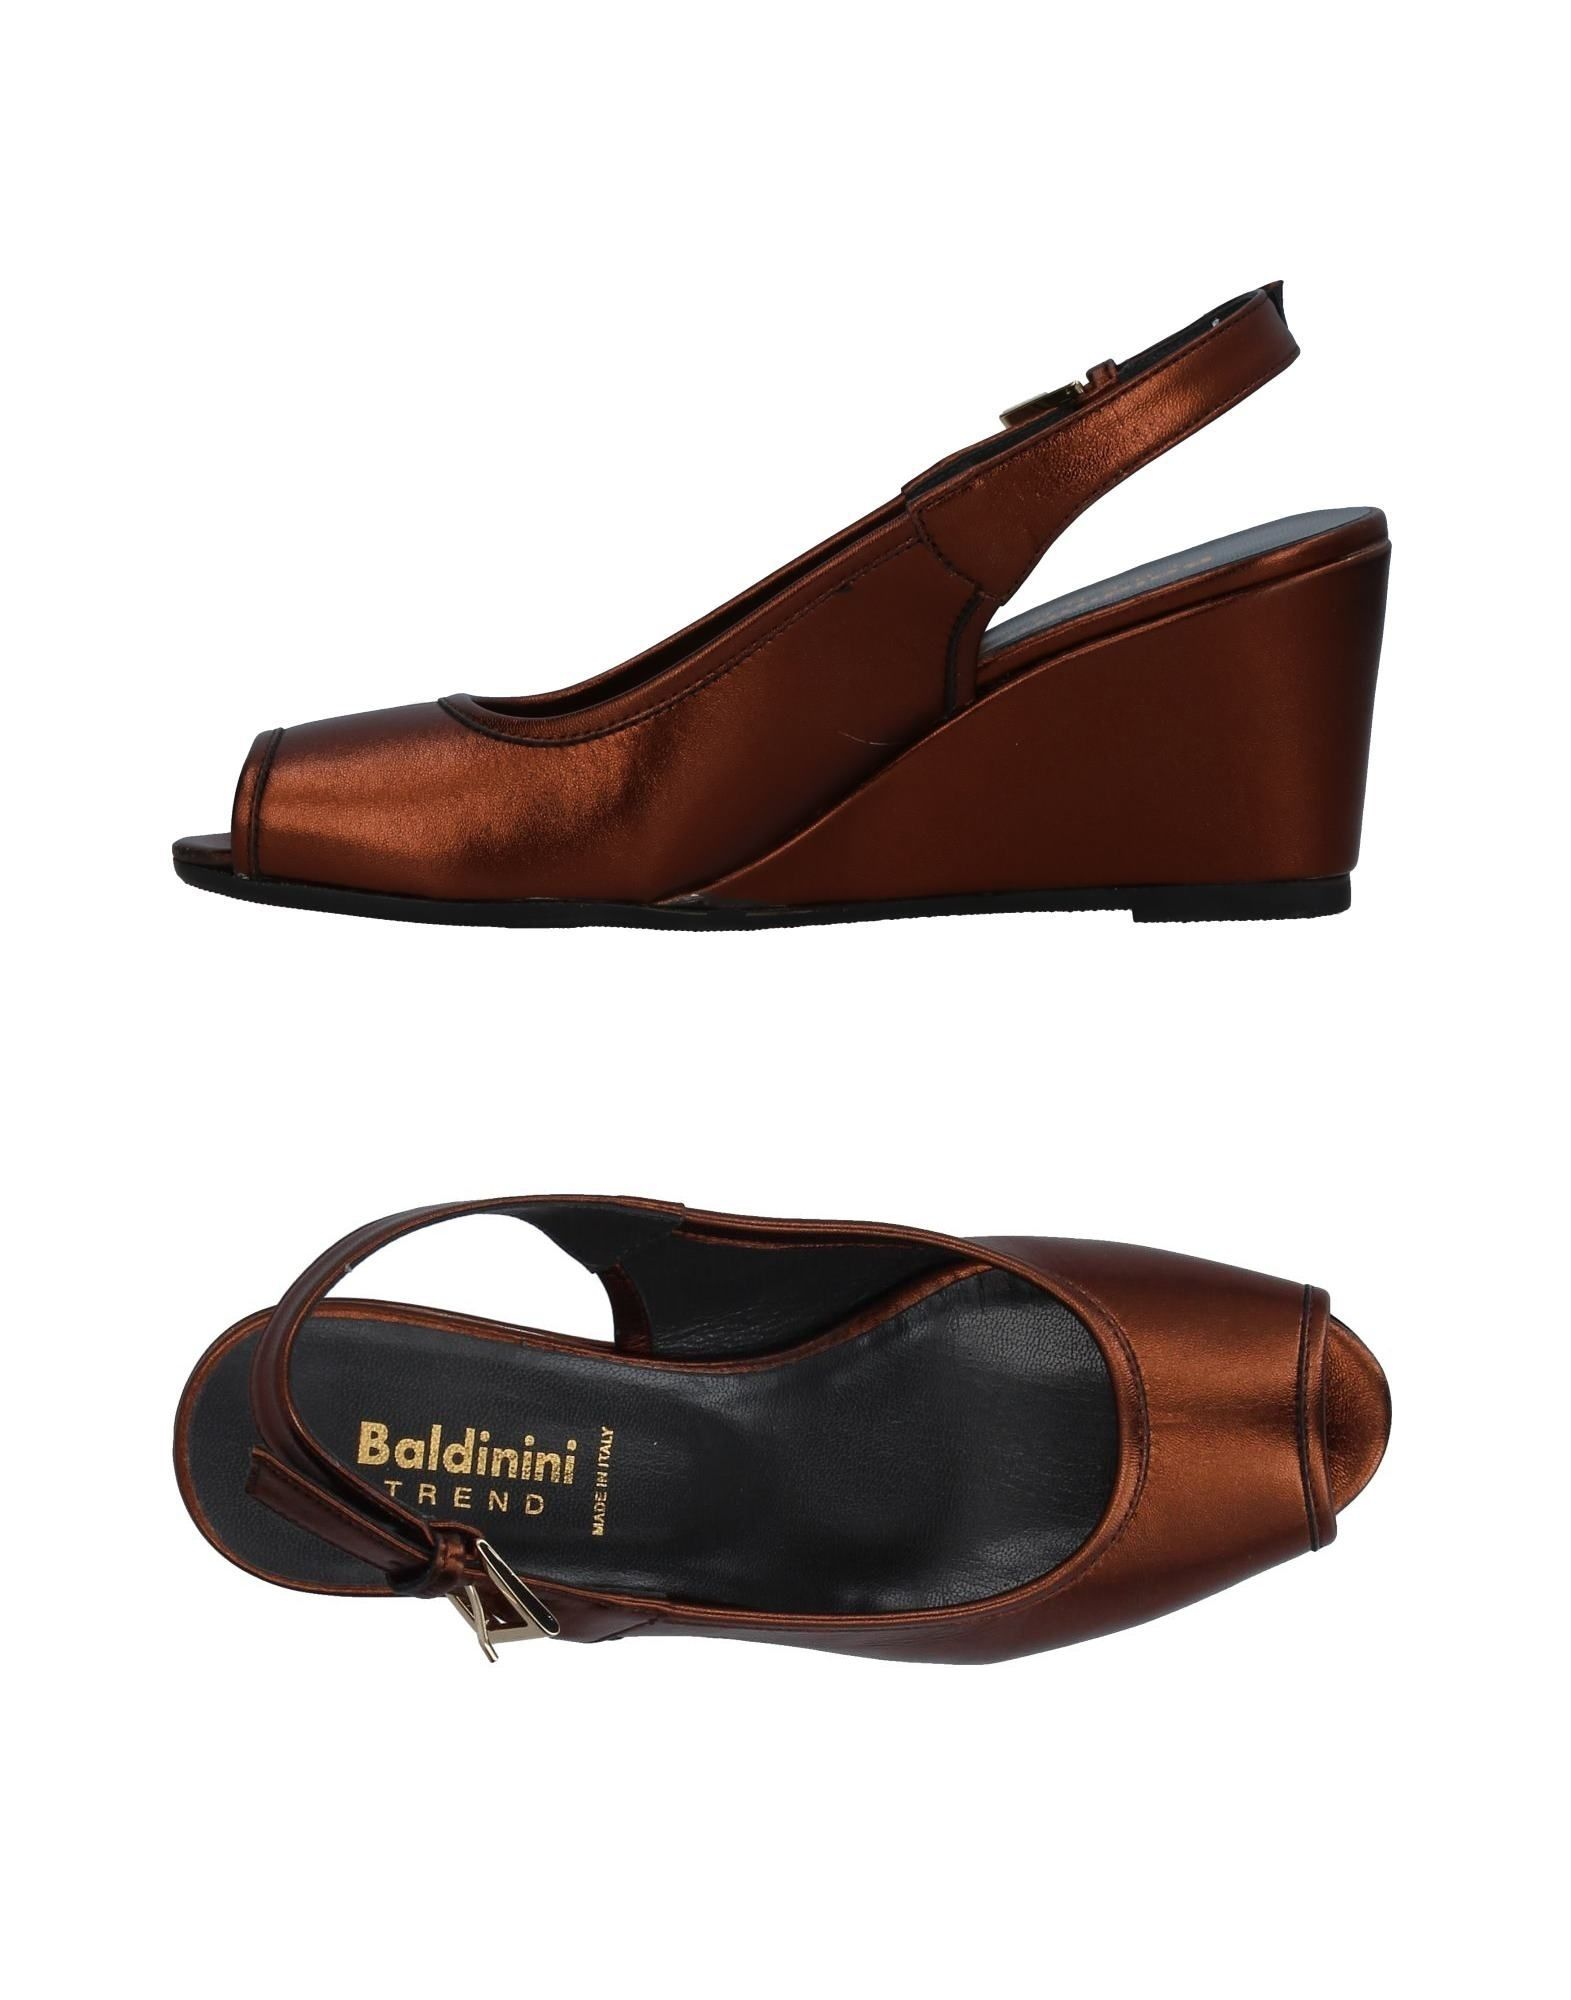 Sandali - Baldinini Trend Donna - Sandali 11404296MM 2ed86c